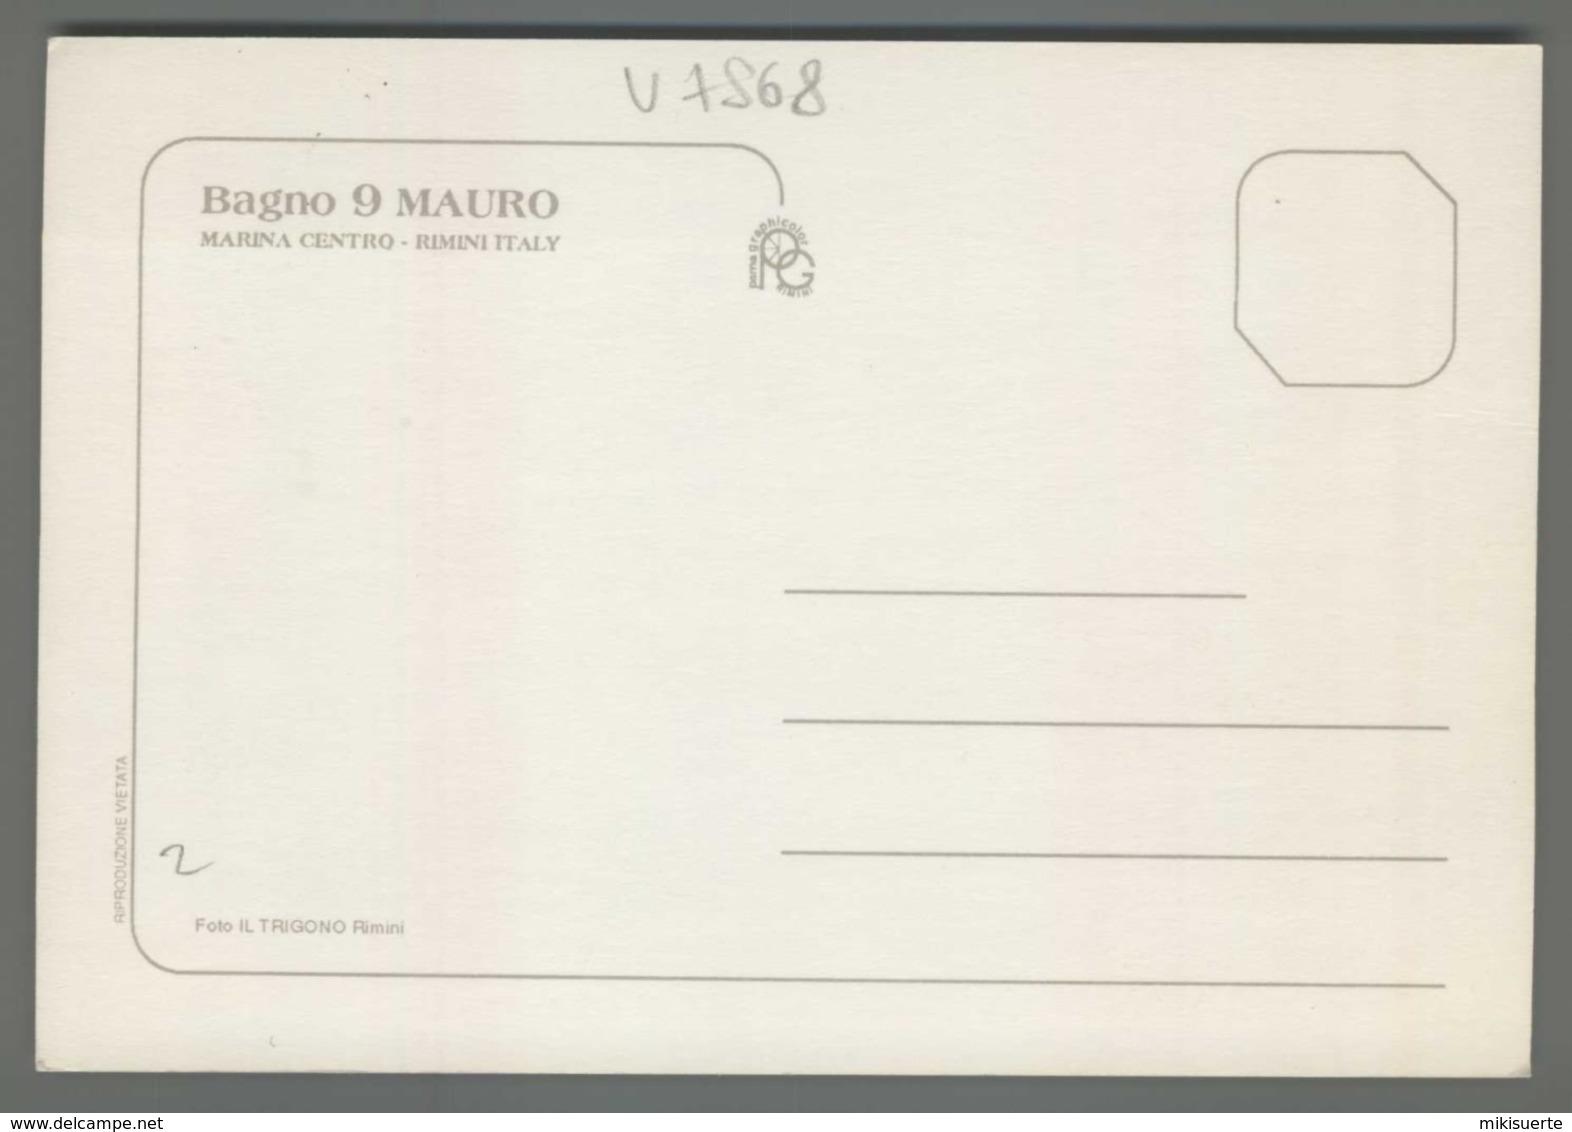 V7868 RIMINI MARINA CENTRO BAGNO 9 MAURO (m) - Rimini